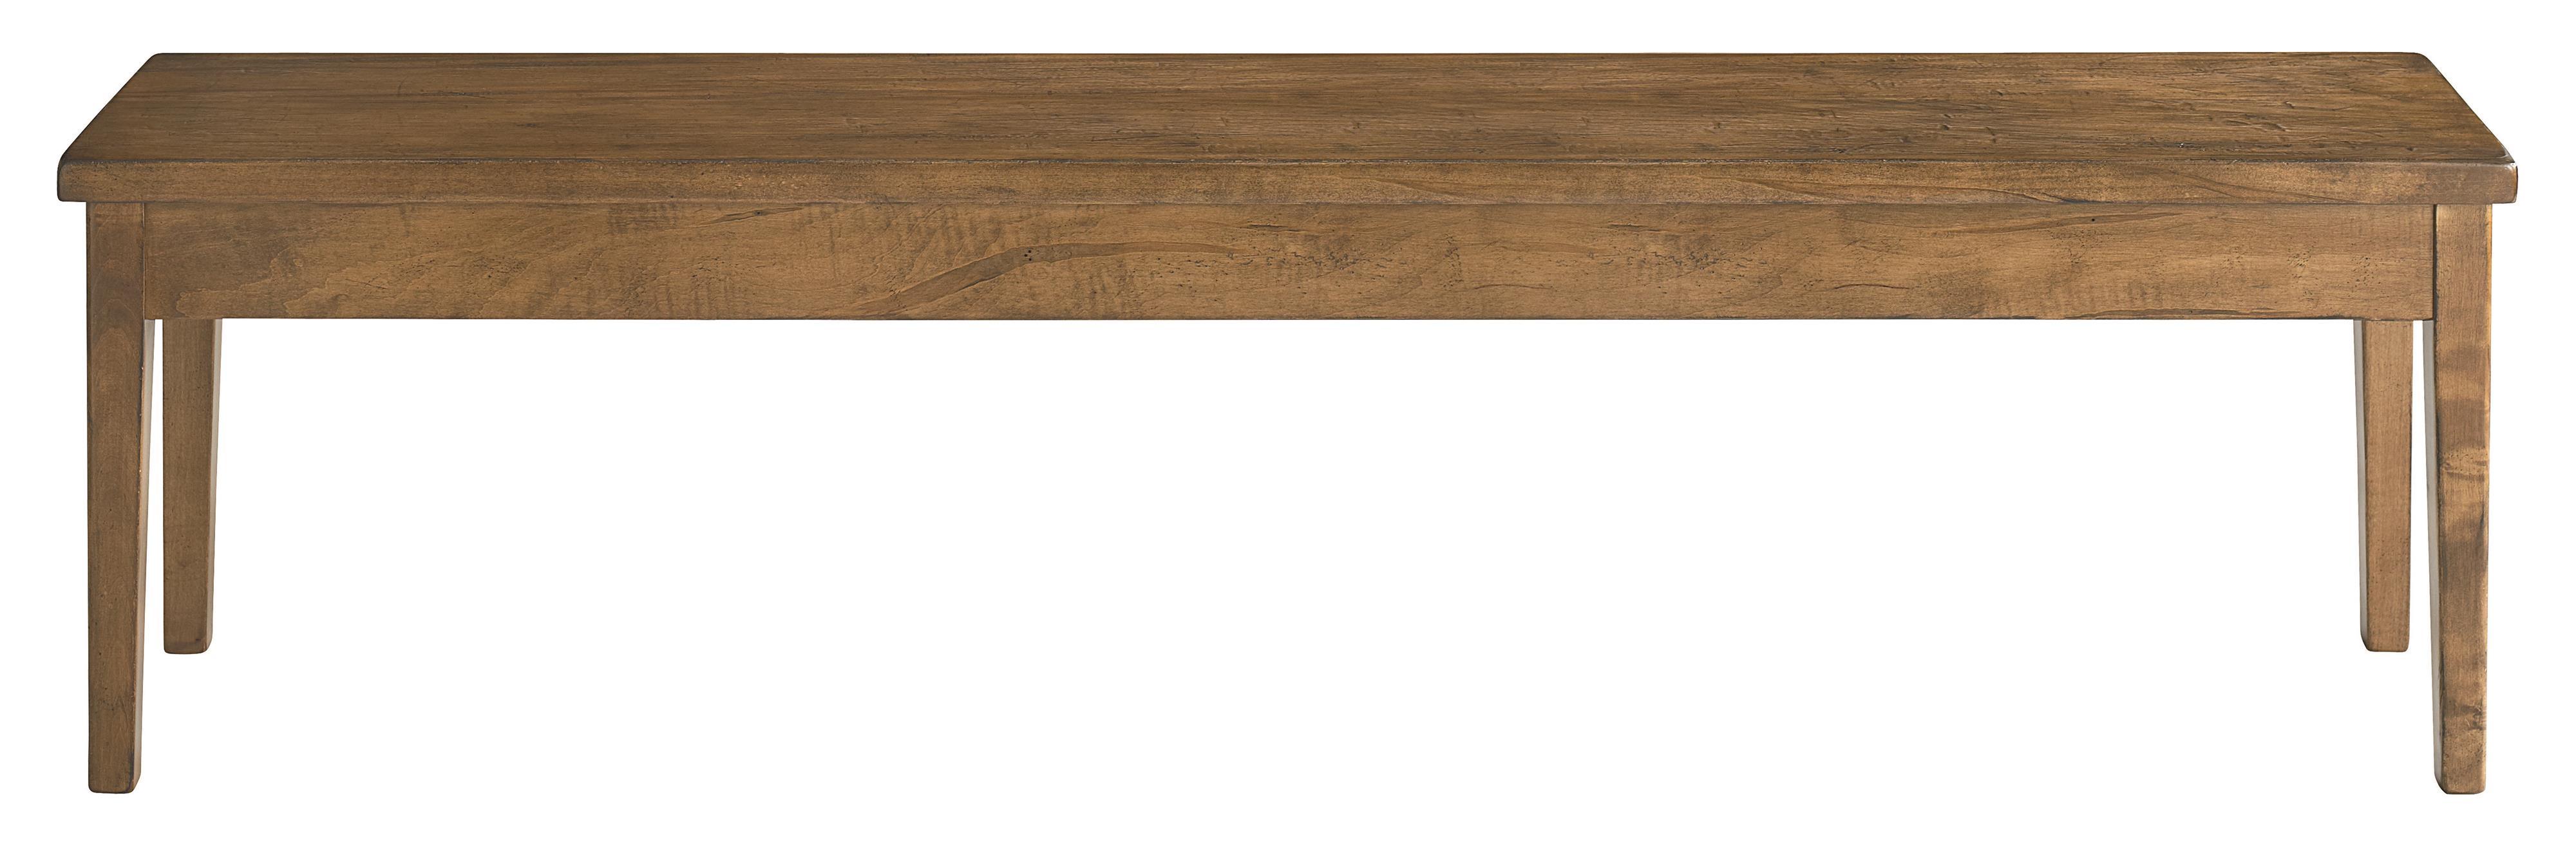 "Bench Made Maple 70"" Hearthside Bench by Bassett at Bassett of Cool Springs"